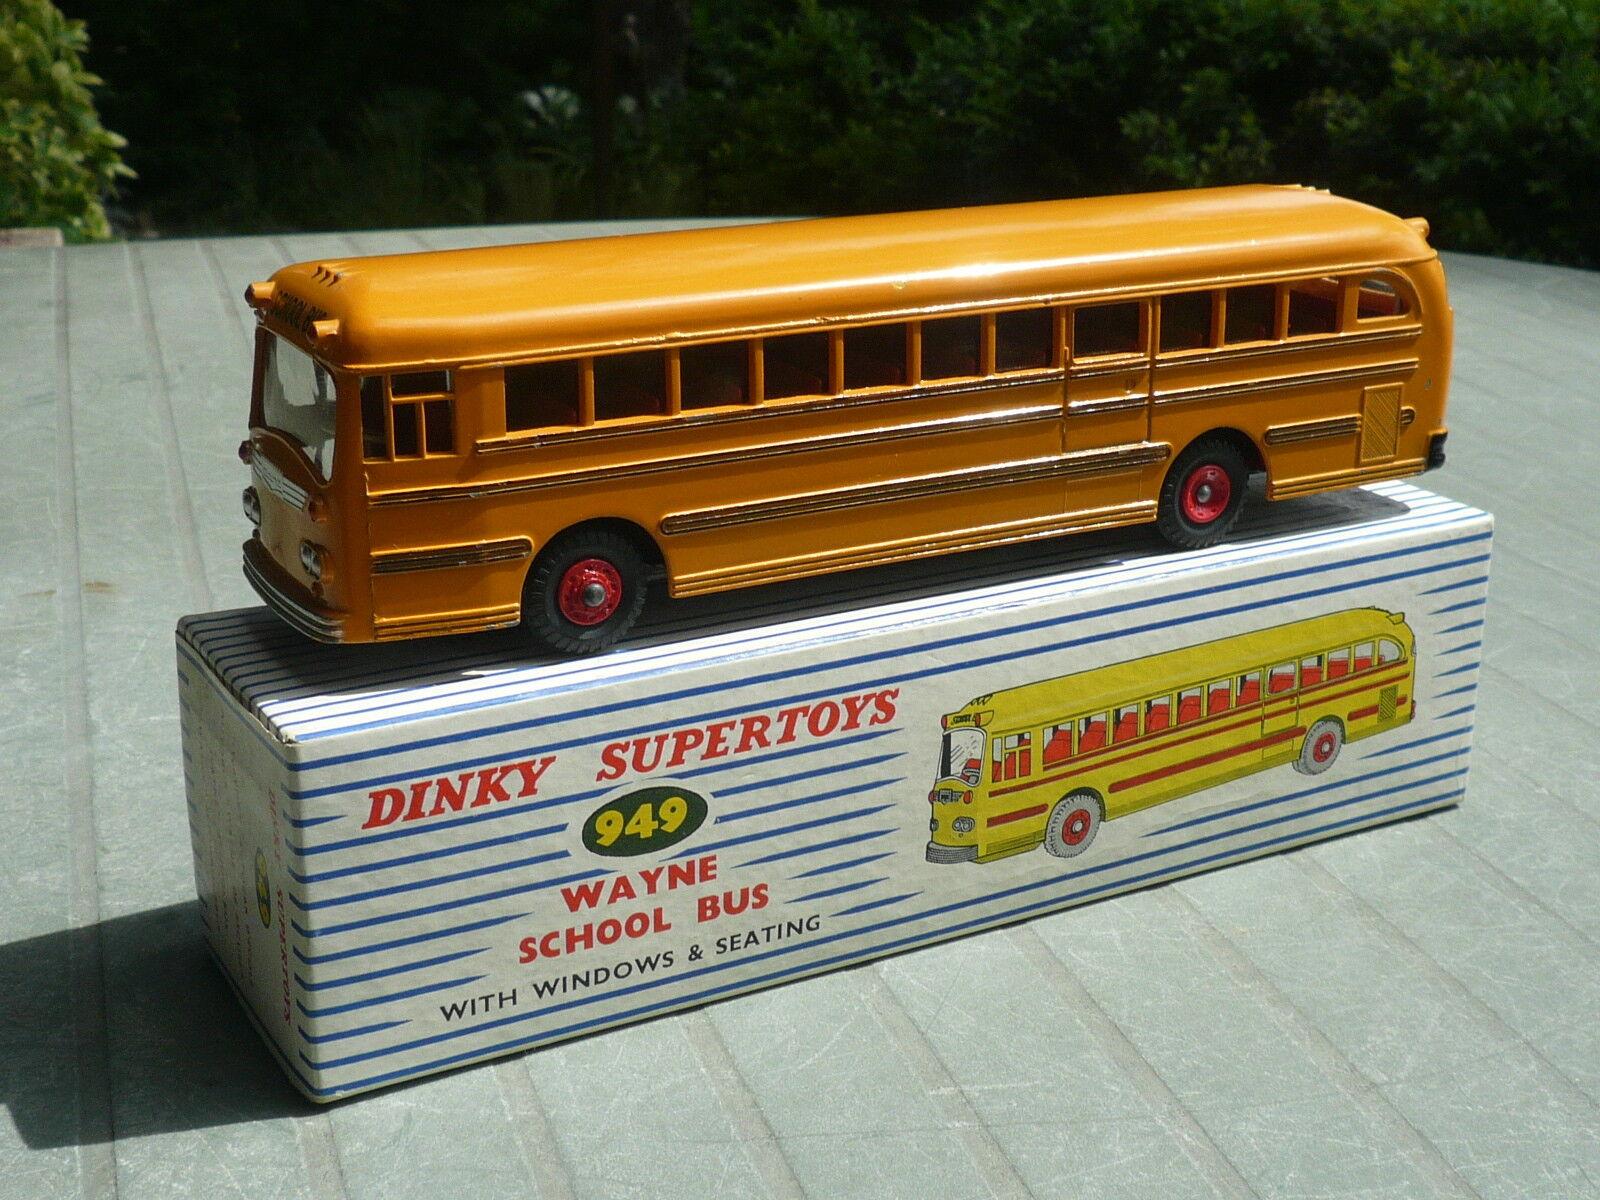 DINKY  TOYS   WAYNE  SCHOOL  BUS    949 | Formes élégantes